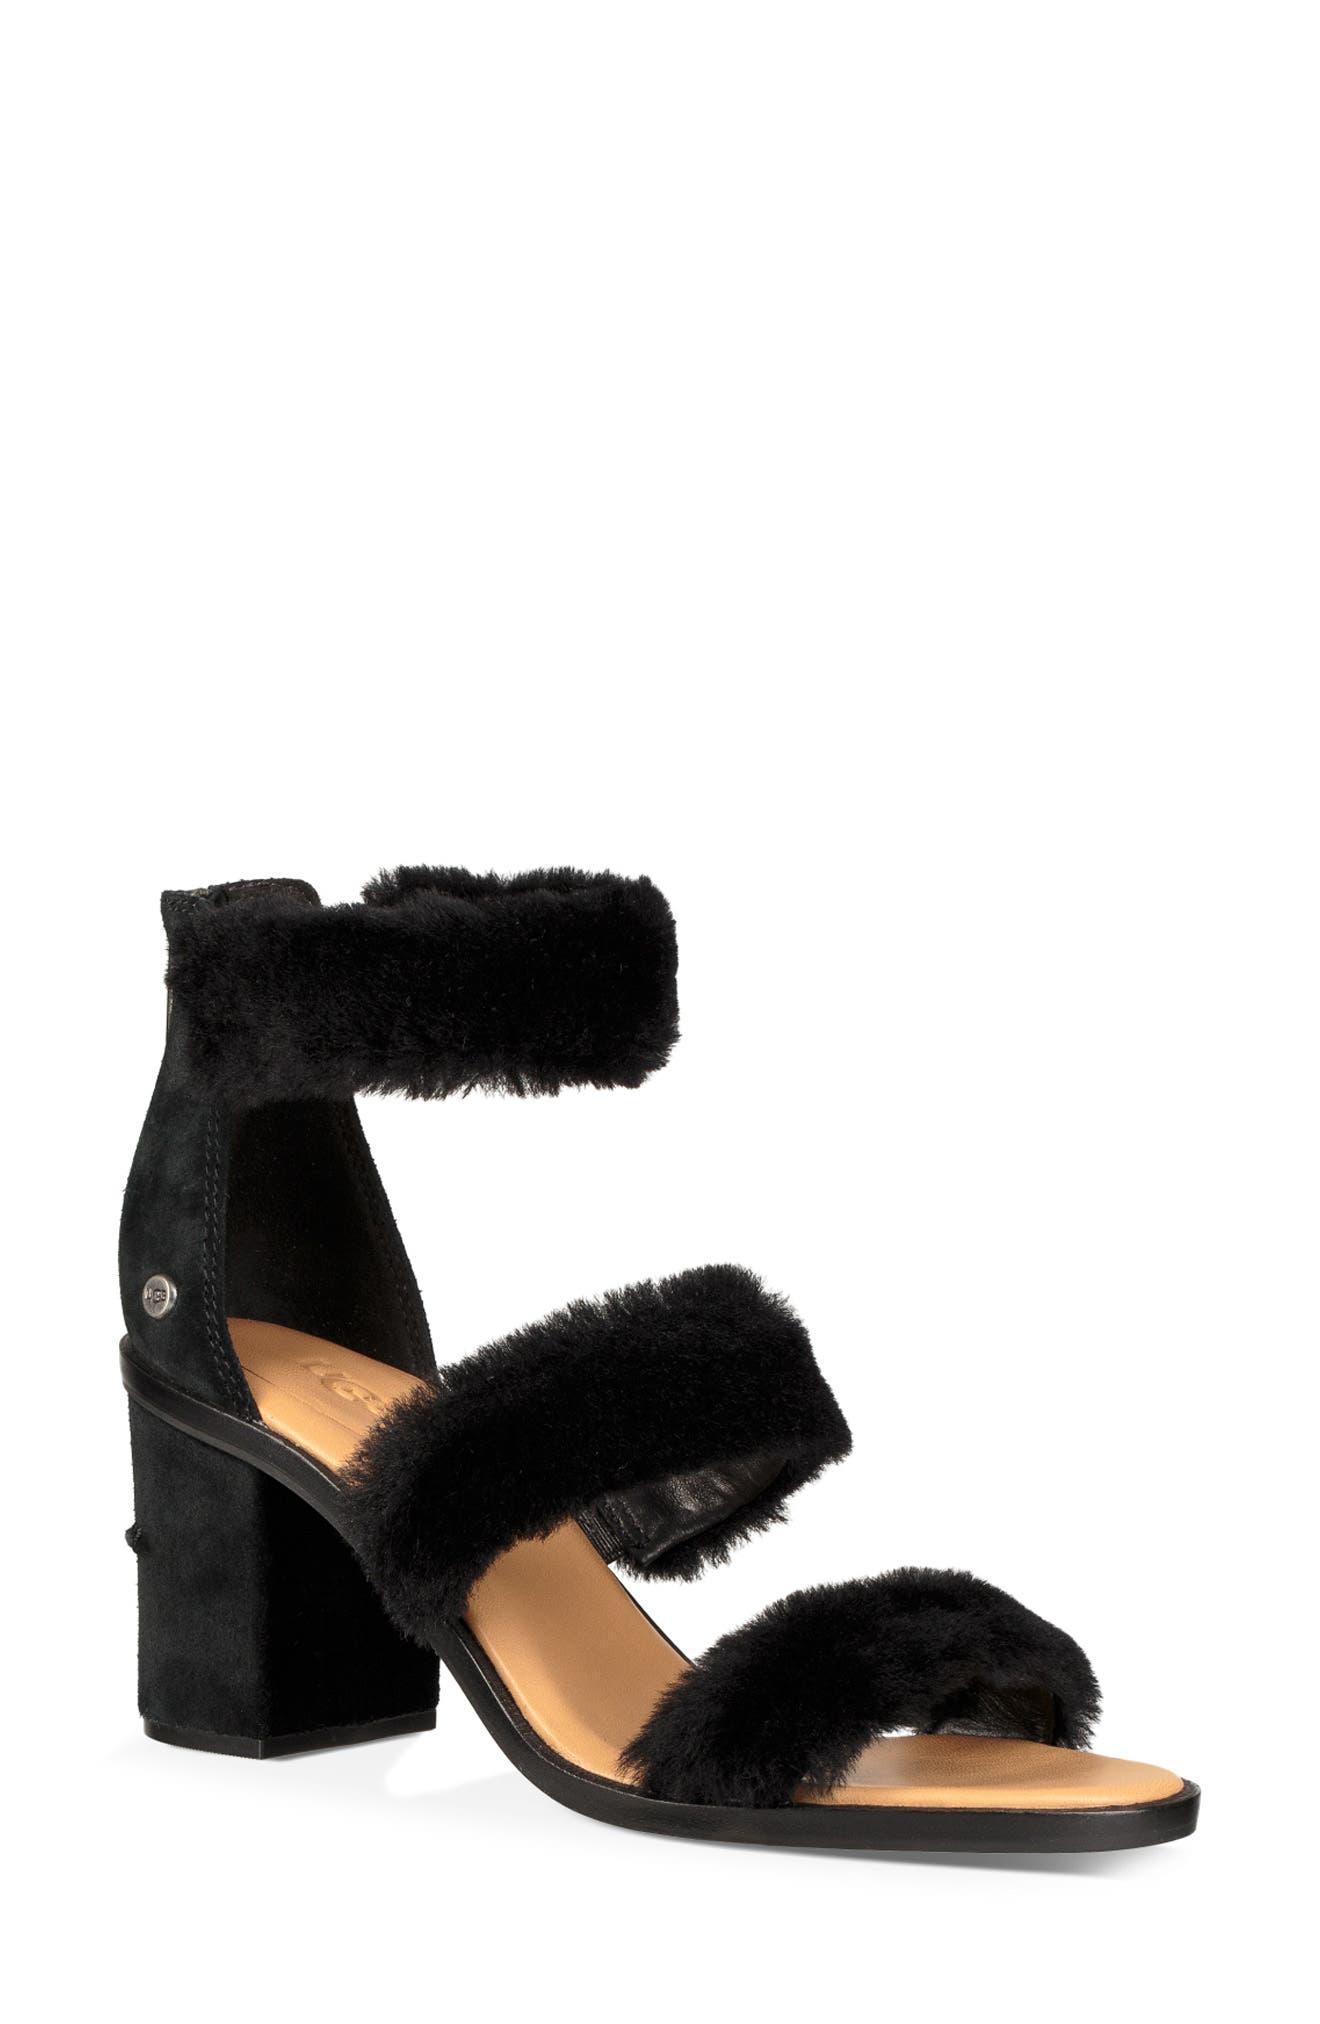 Dey Rey Genuine Shearling Sandal,                             Main thumbnail 1, color,                             BLACK